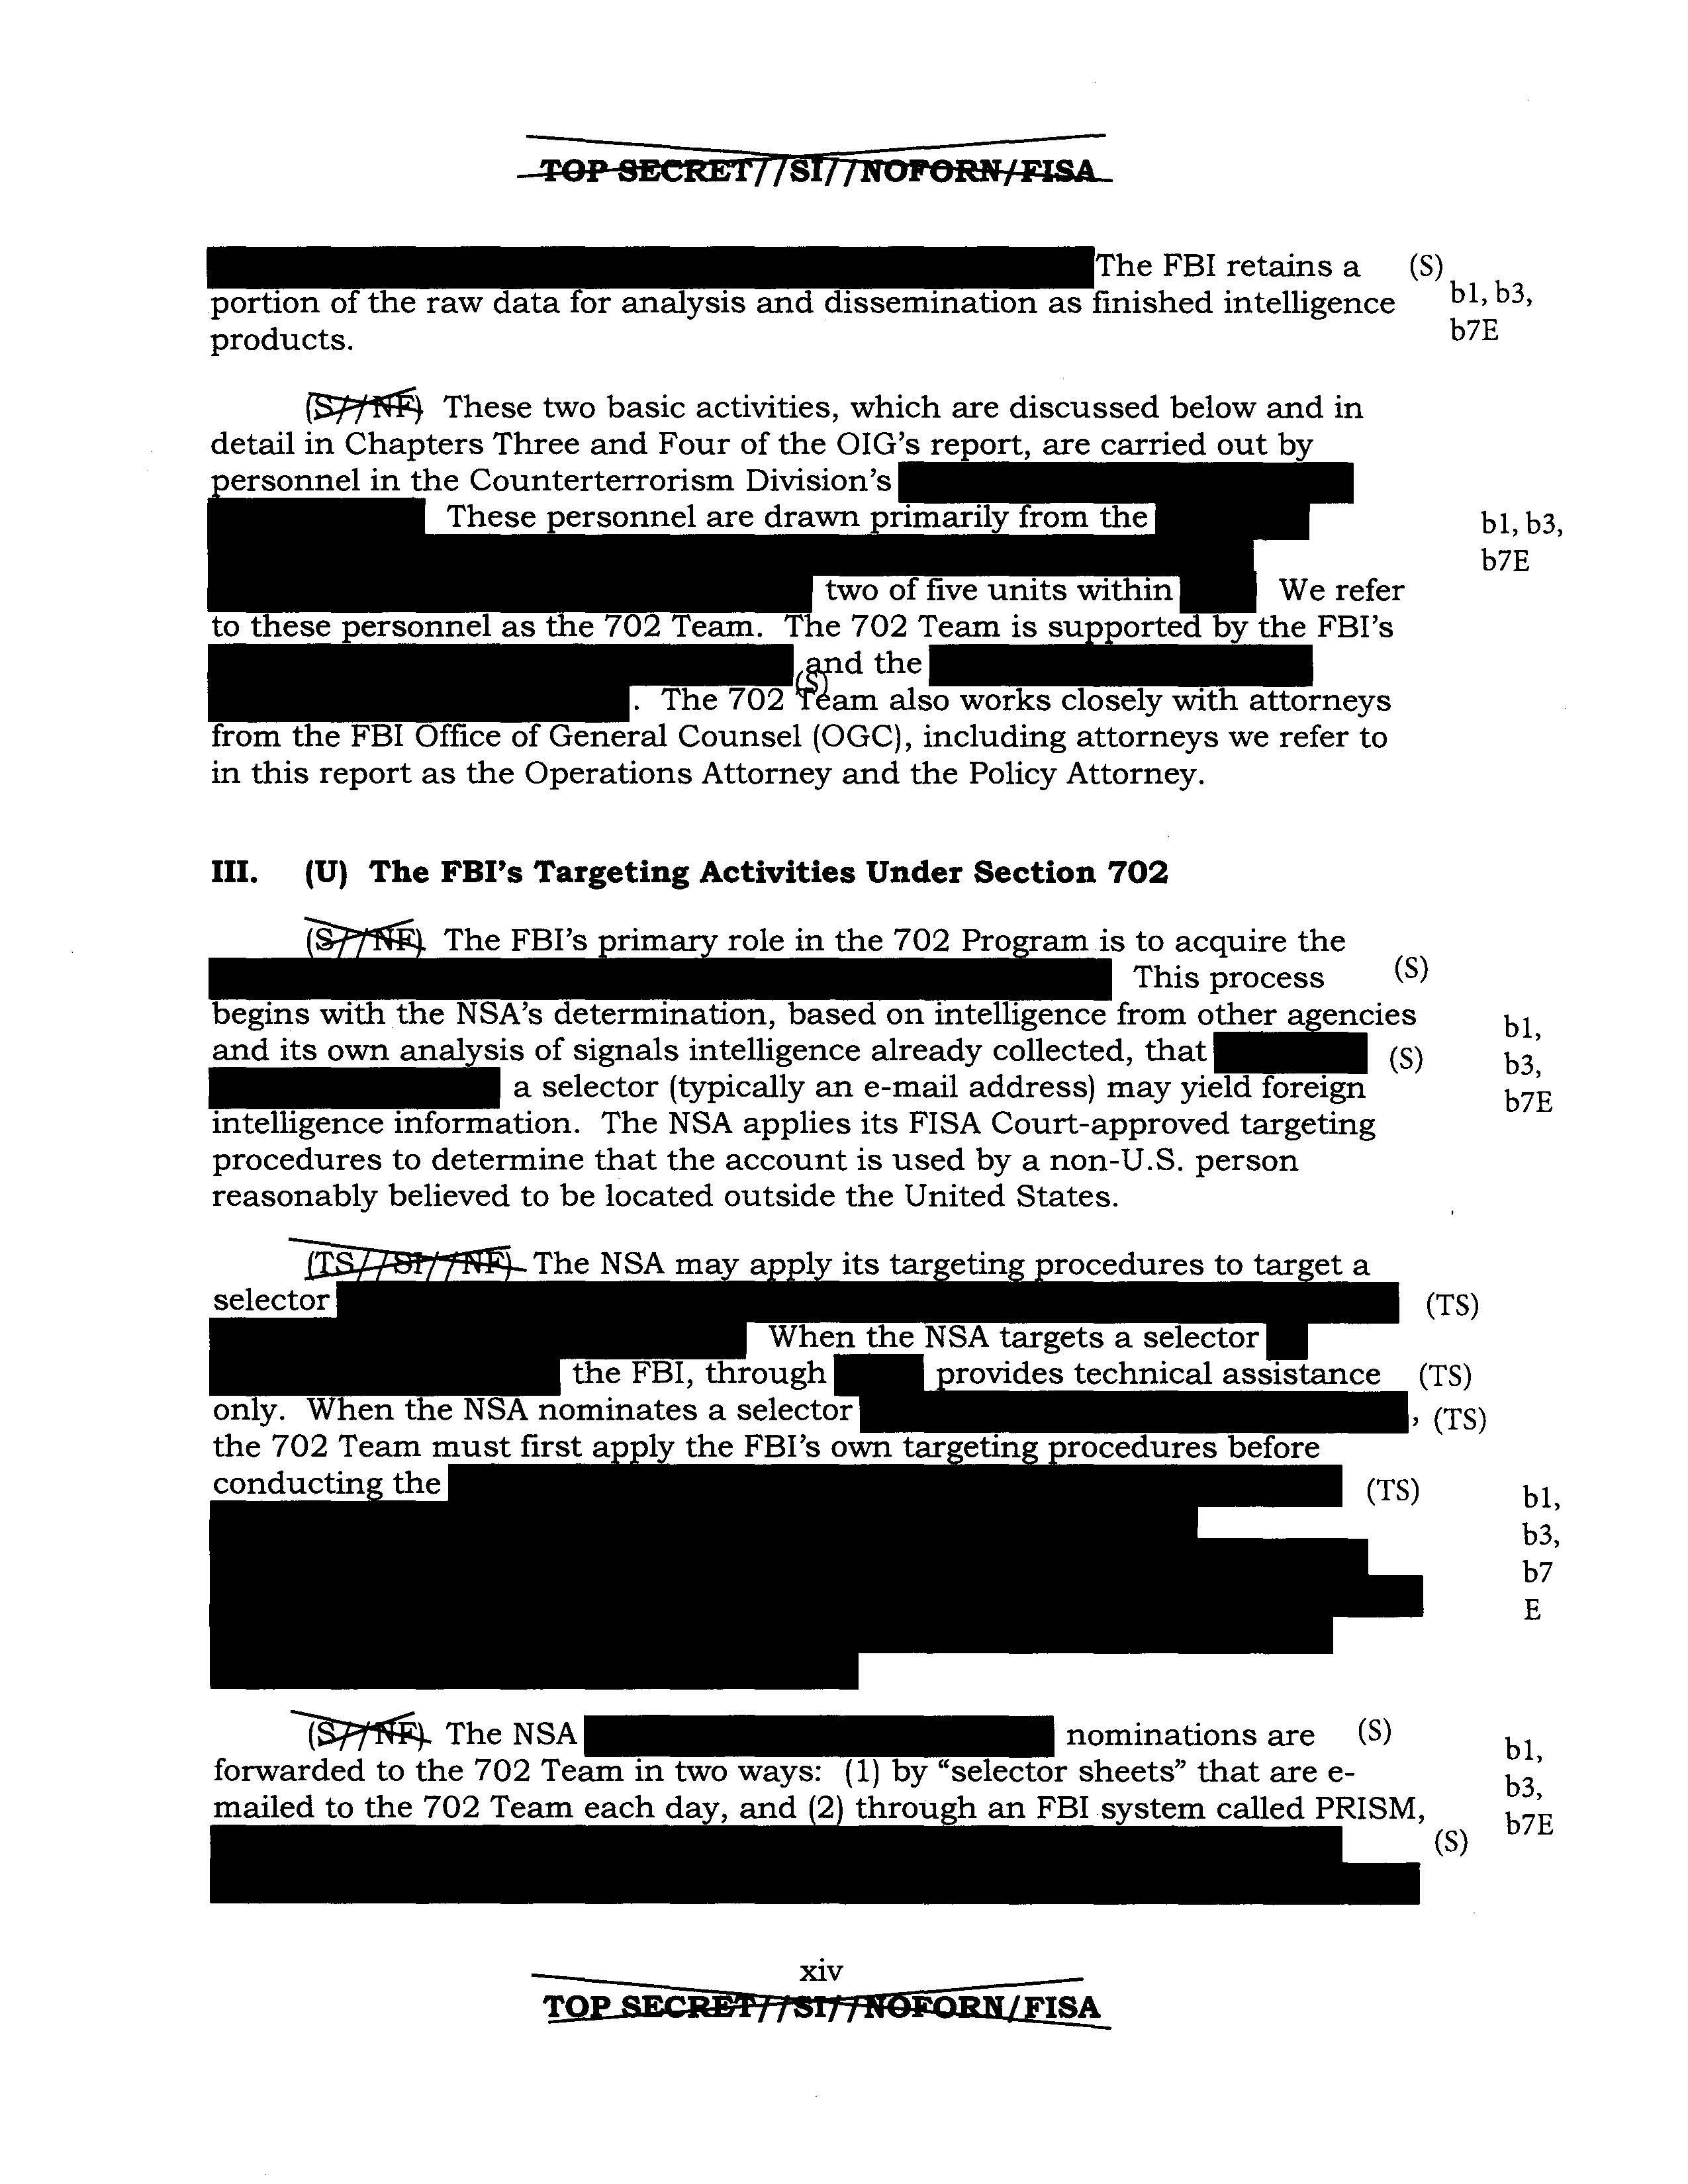 DoJ Inspector General Report on FBI Surveillance Under FISA Section